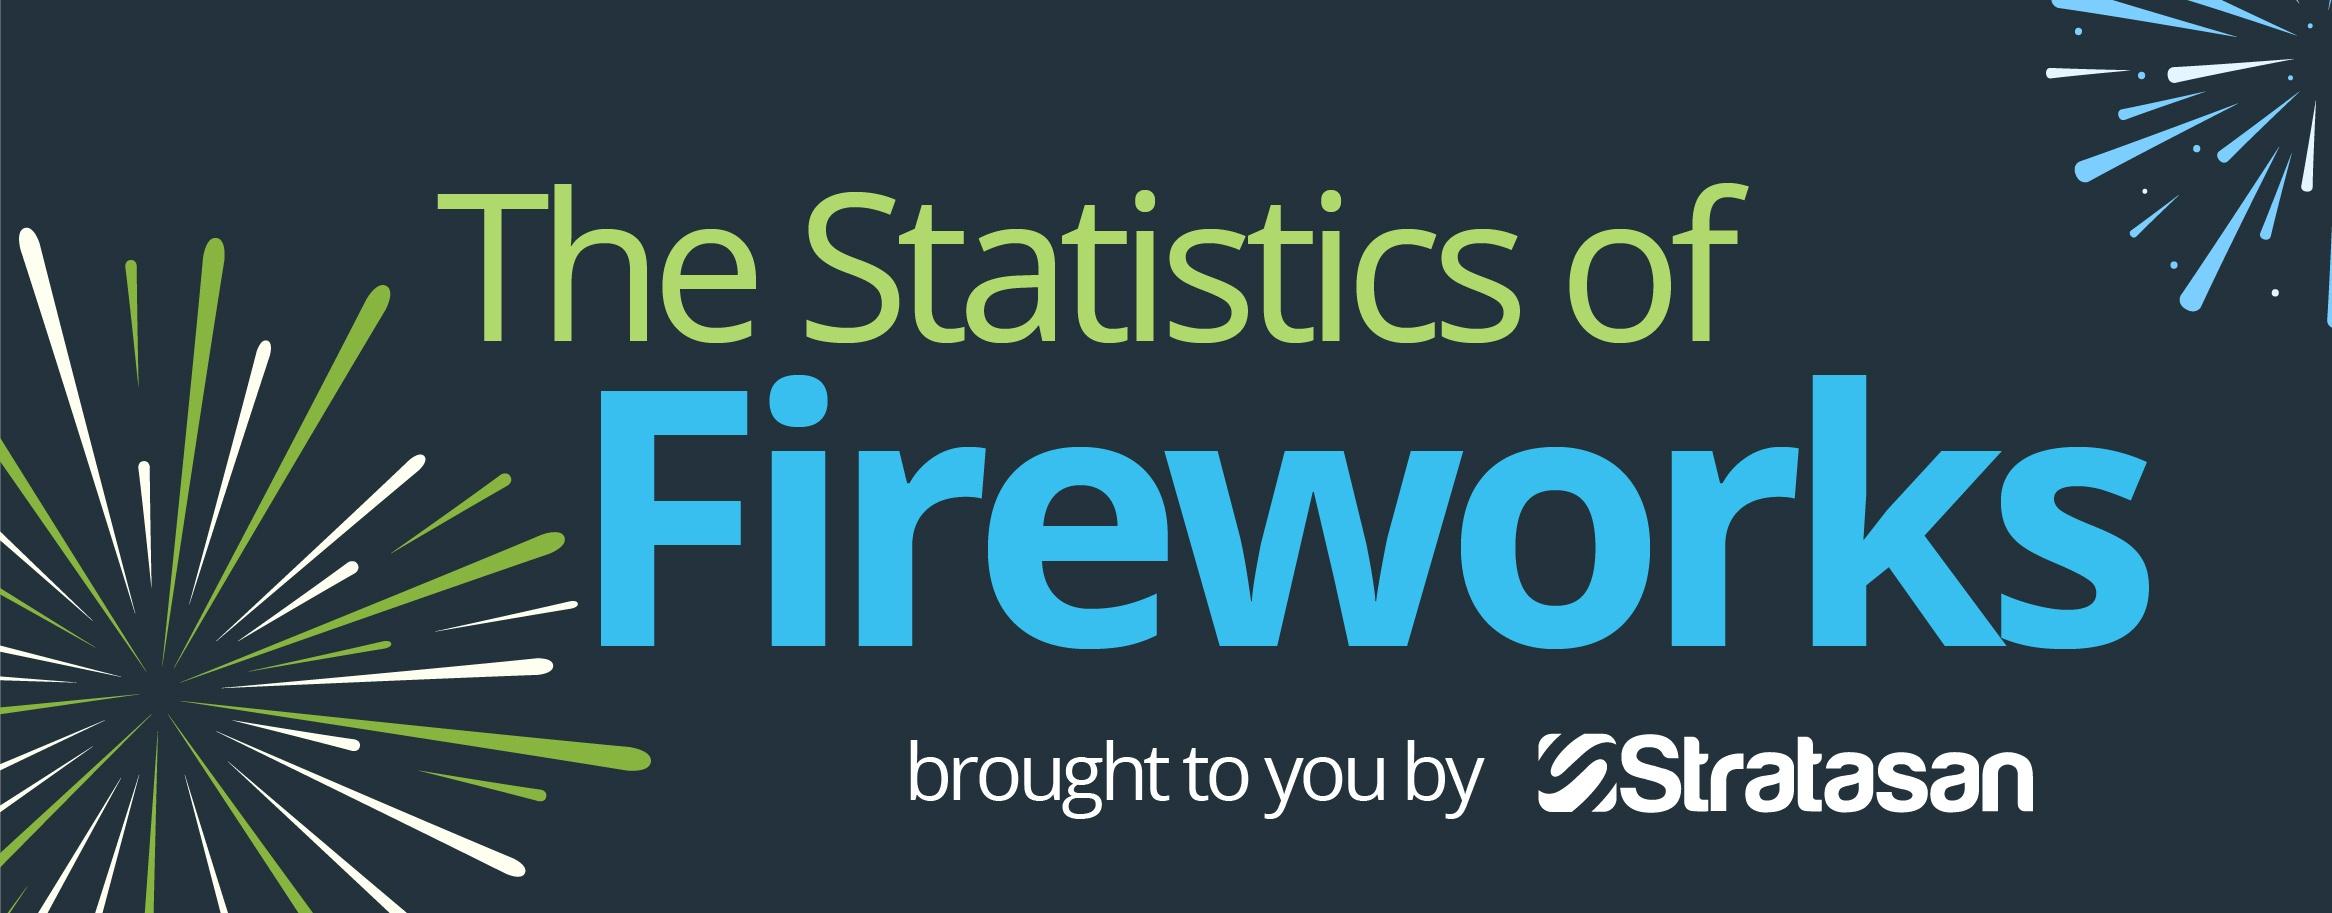 FireworksInfographic_header